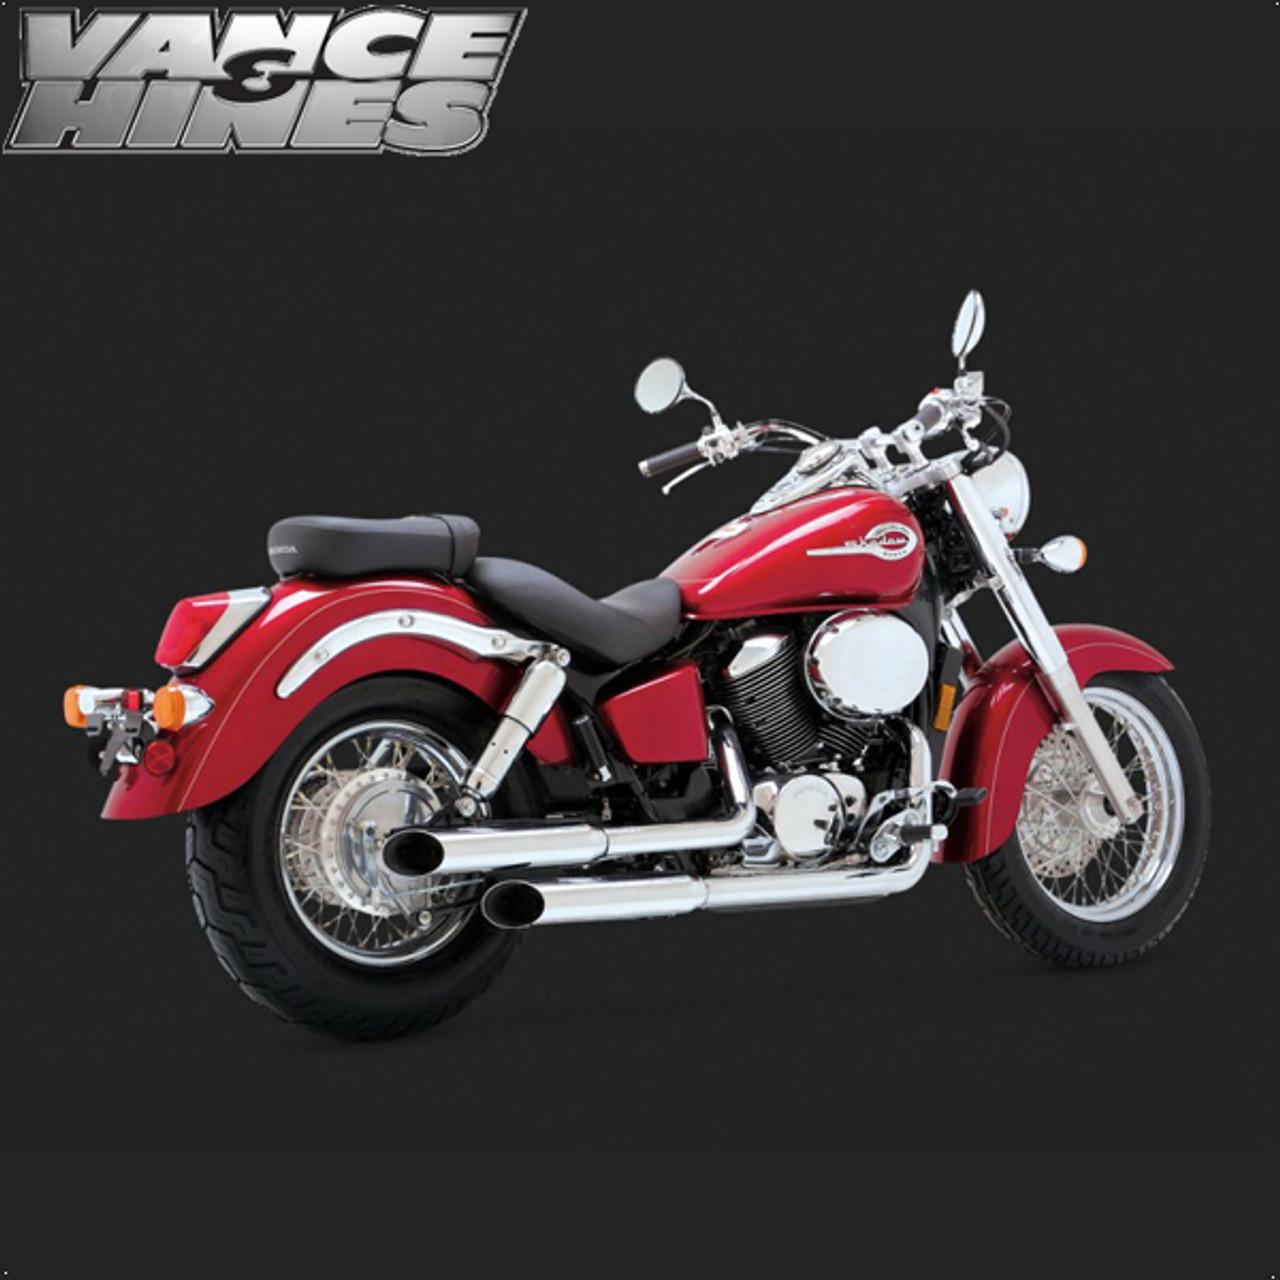 vance hines cruzer full exhaust system honda shadow ace 750 98 03